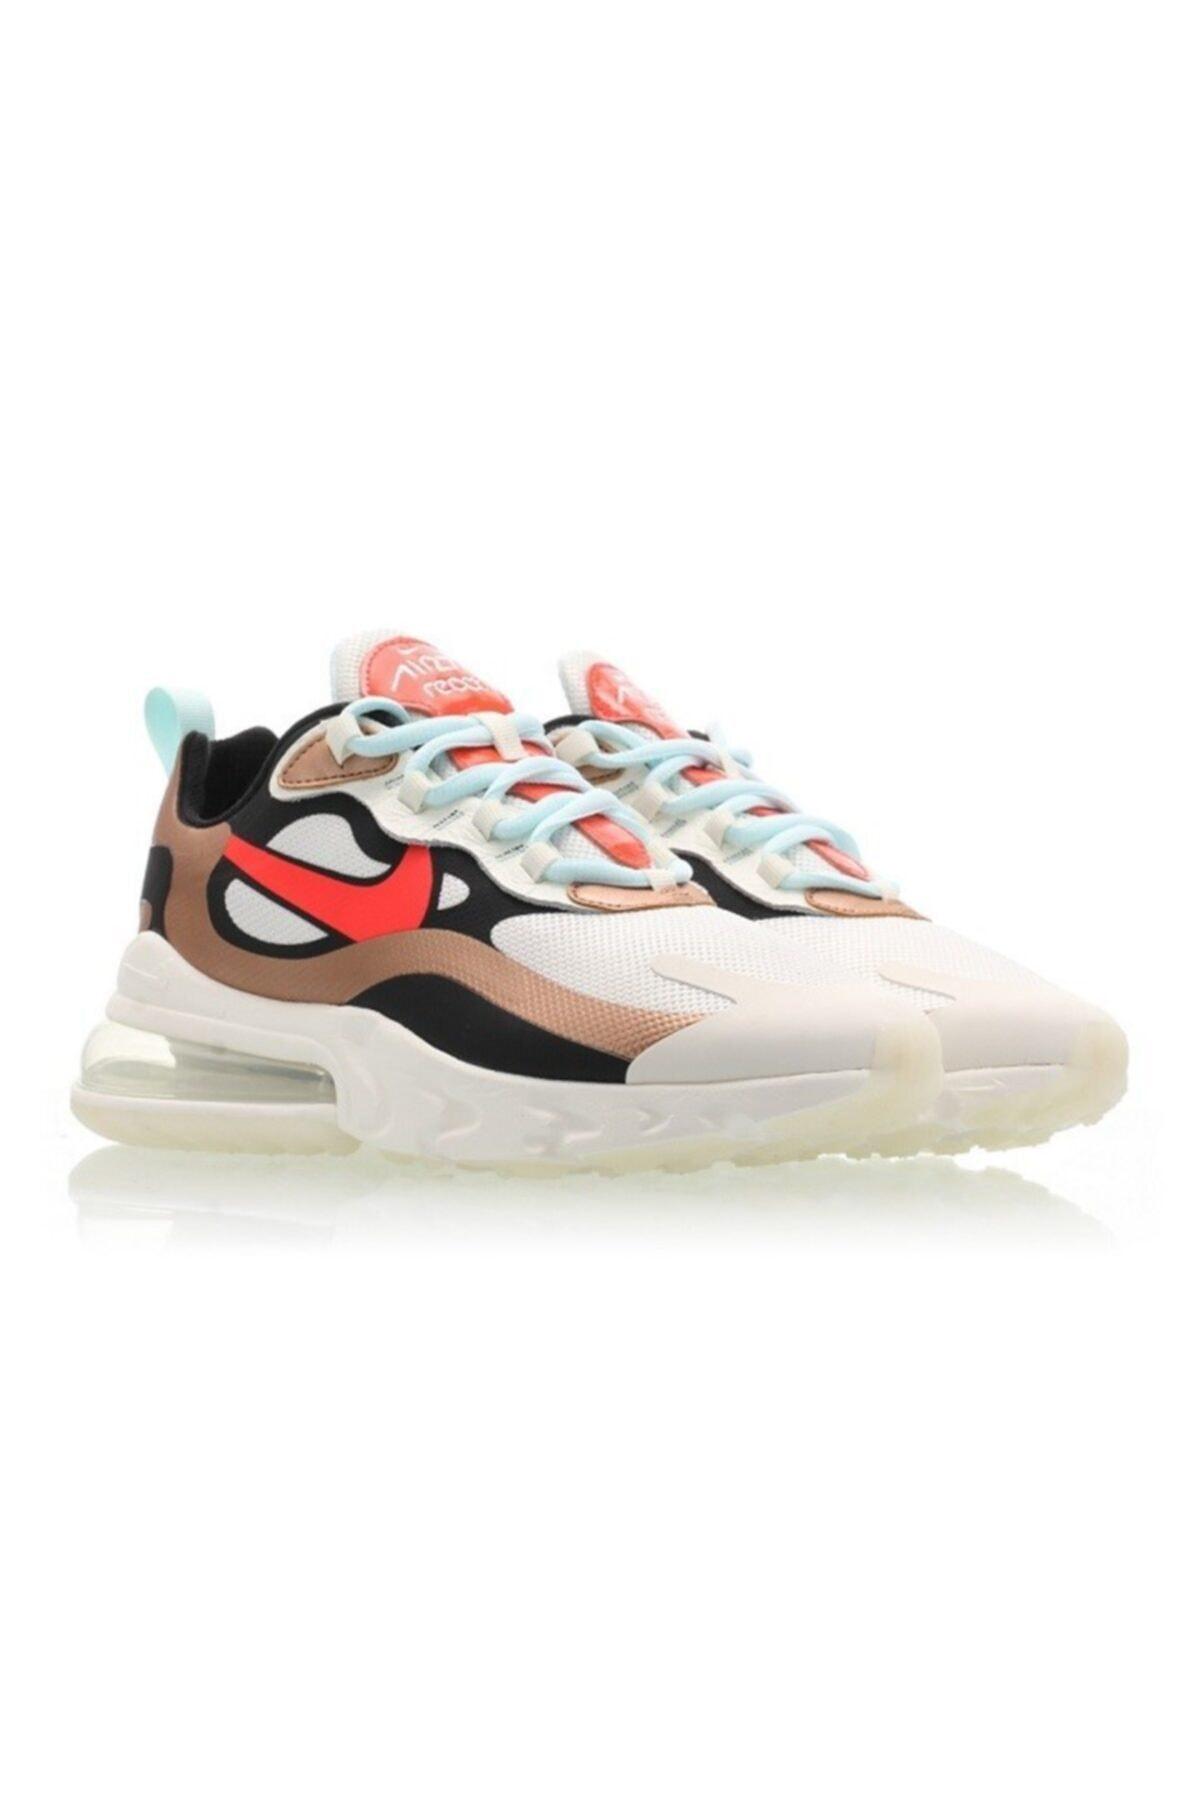 Nike Air Max 270 React Kadın Spor Ayakkabı Ct3428-100 2